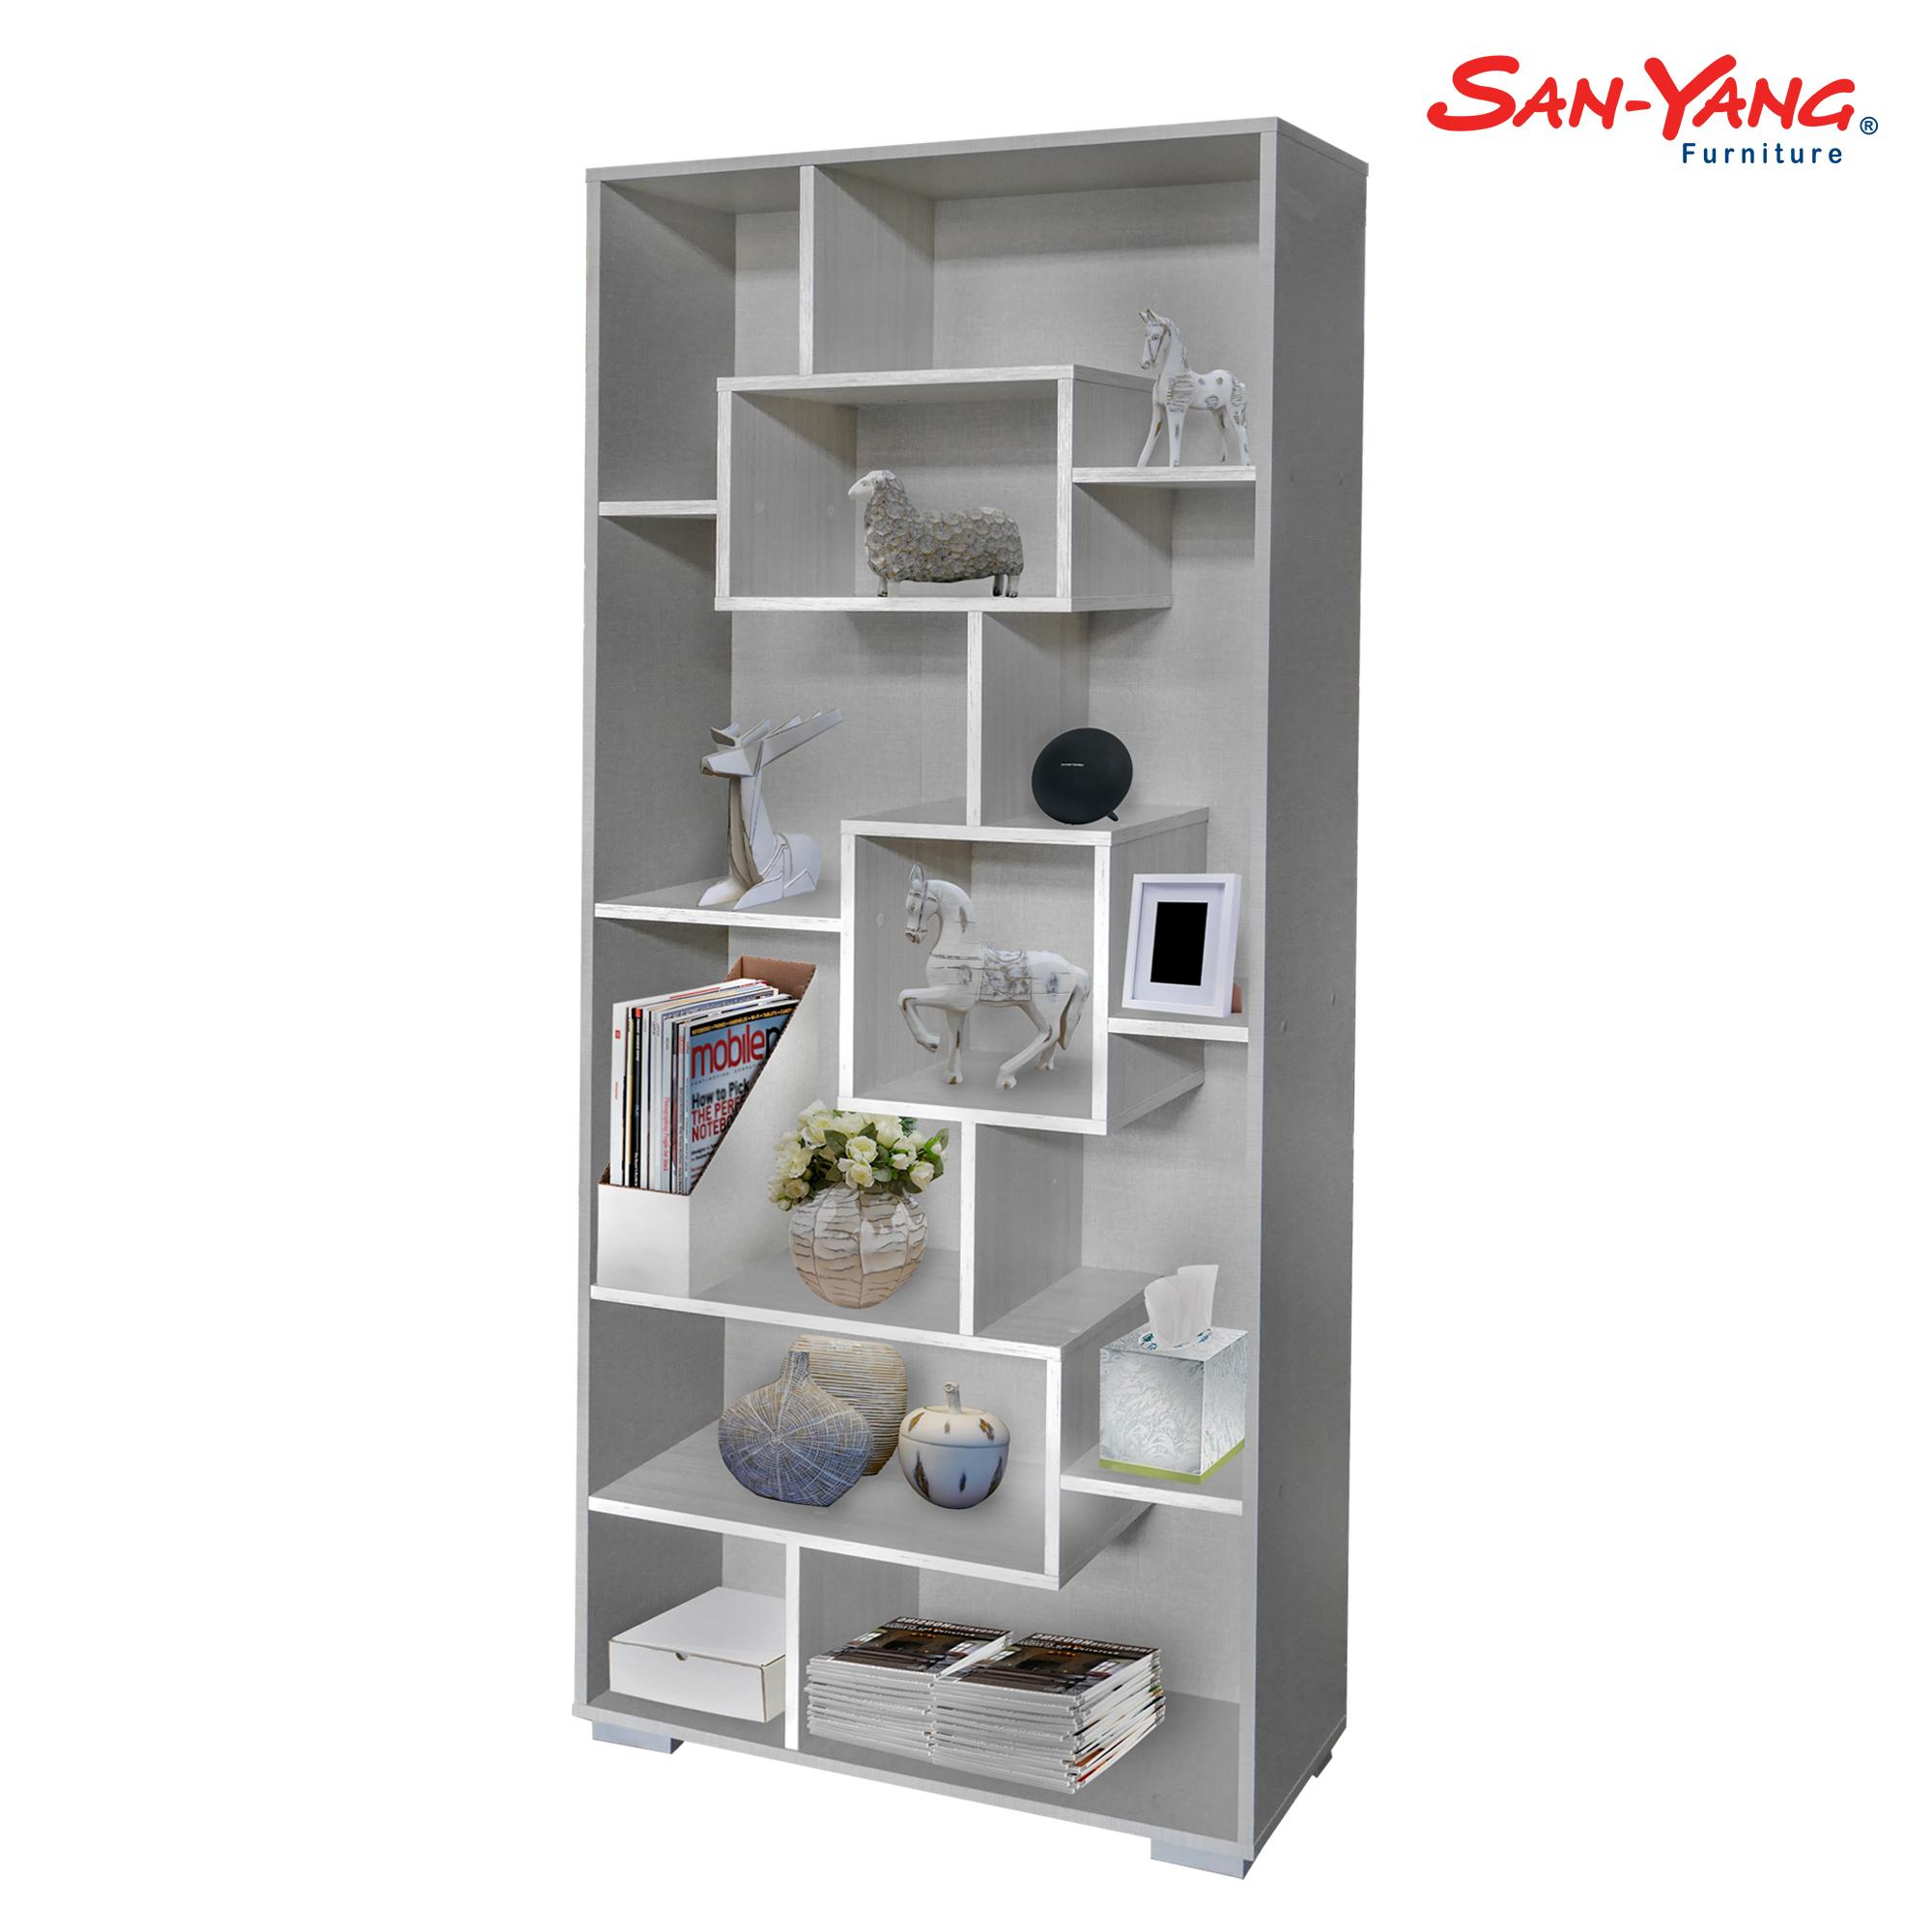 San Yang Philippines San Yang Price List San Yang Furniture For